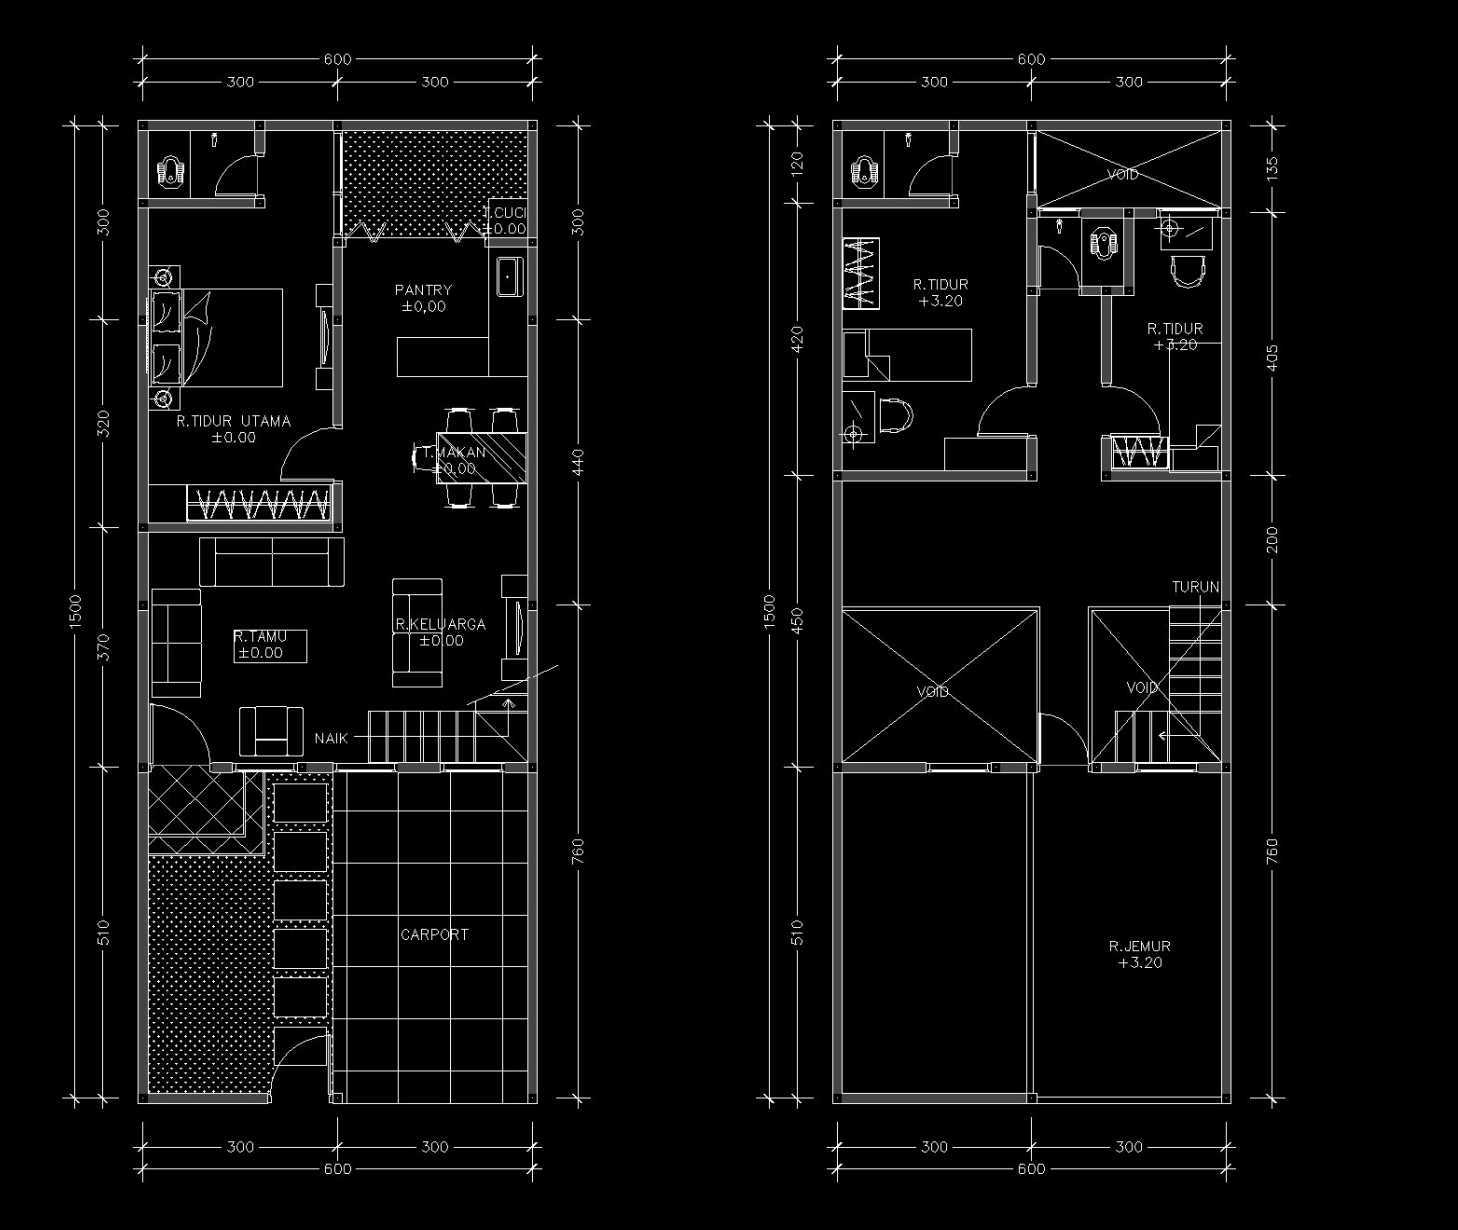 Ashari Architect Studio Desain Rumah Bapak Mukar Makassar, Kota Makassar, Sulawesi Selatan, Indonesia Makassar, Kota Makassar, Sulawesi Selatan, Indonesia Ashari-Architect-Studio-Desain-Rumah-Bapak-Mukar   94953